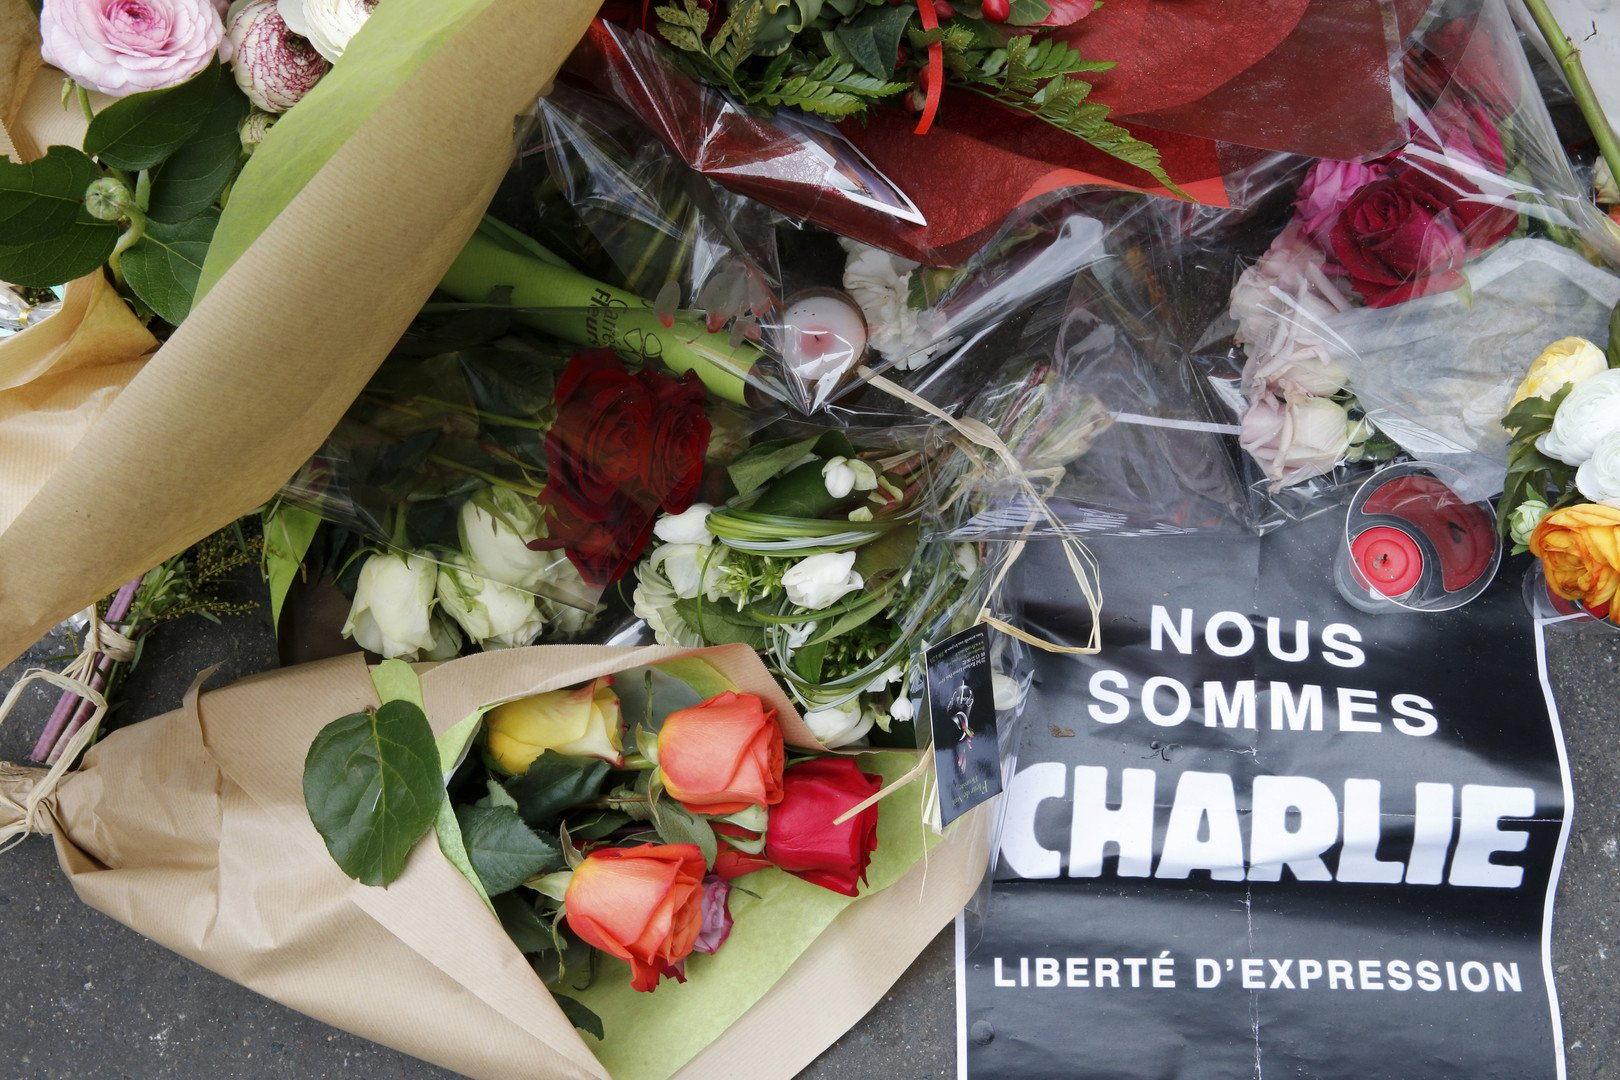 Médias: Les familles des terroristes condamnent les attentats